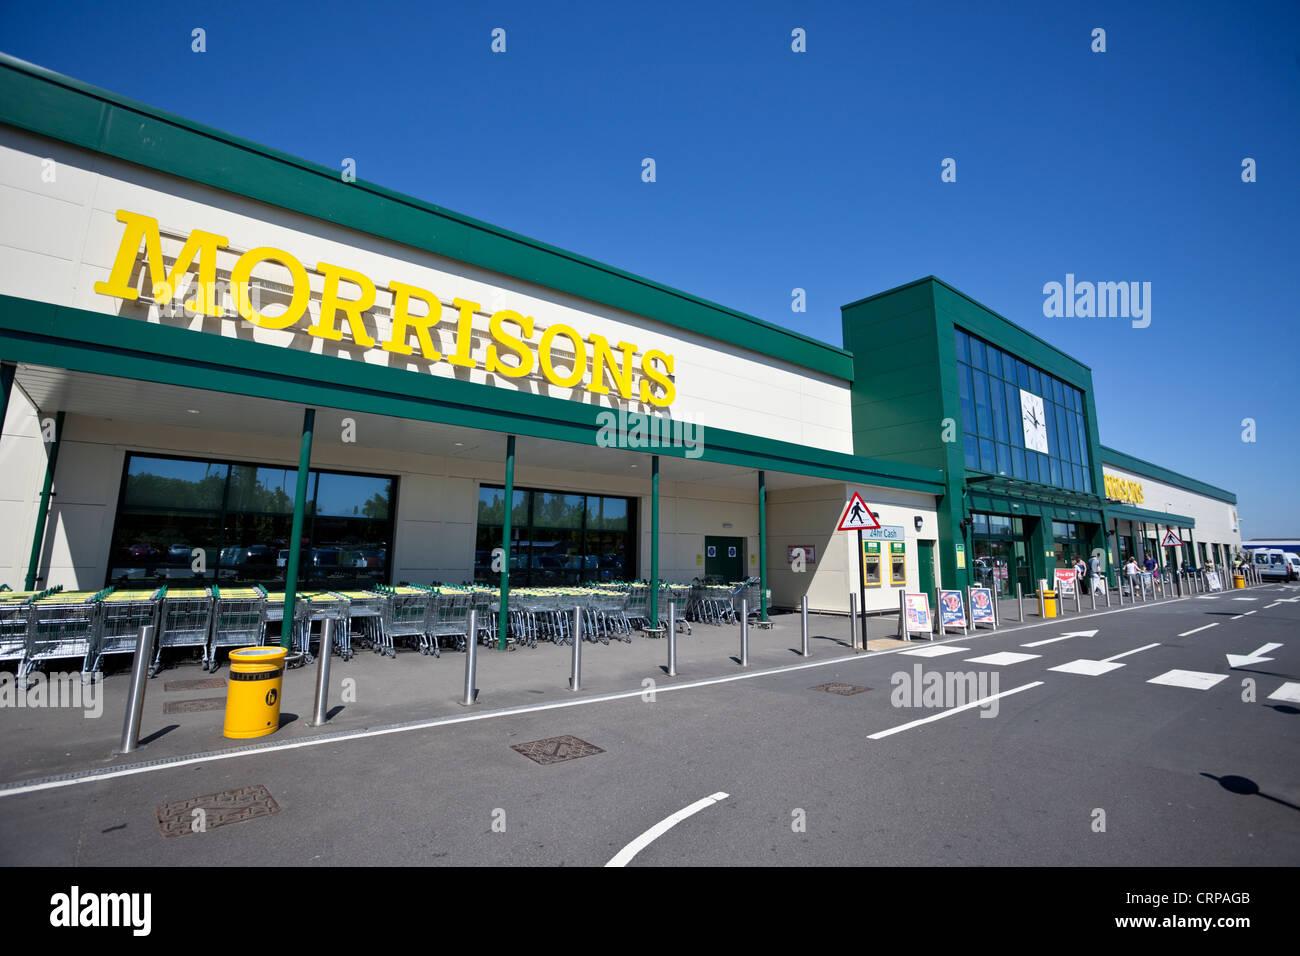 Supermercado Morrison, Borehamwood, Hertfordshire, Inglaterra, Reino Unido. Imagen De Stock